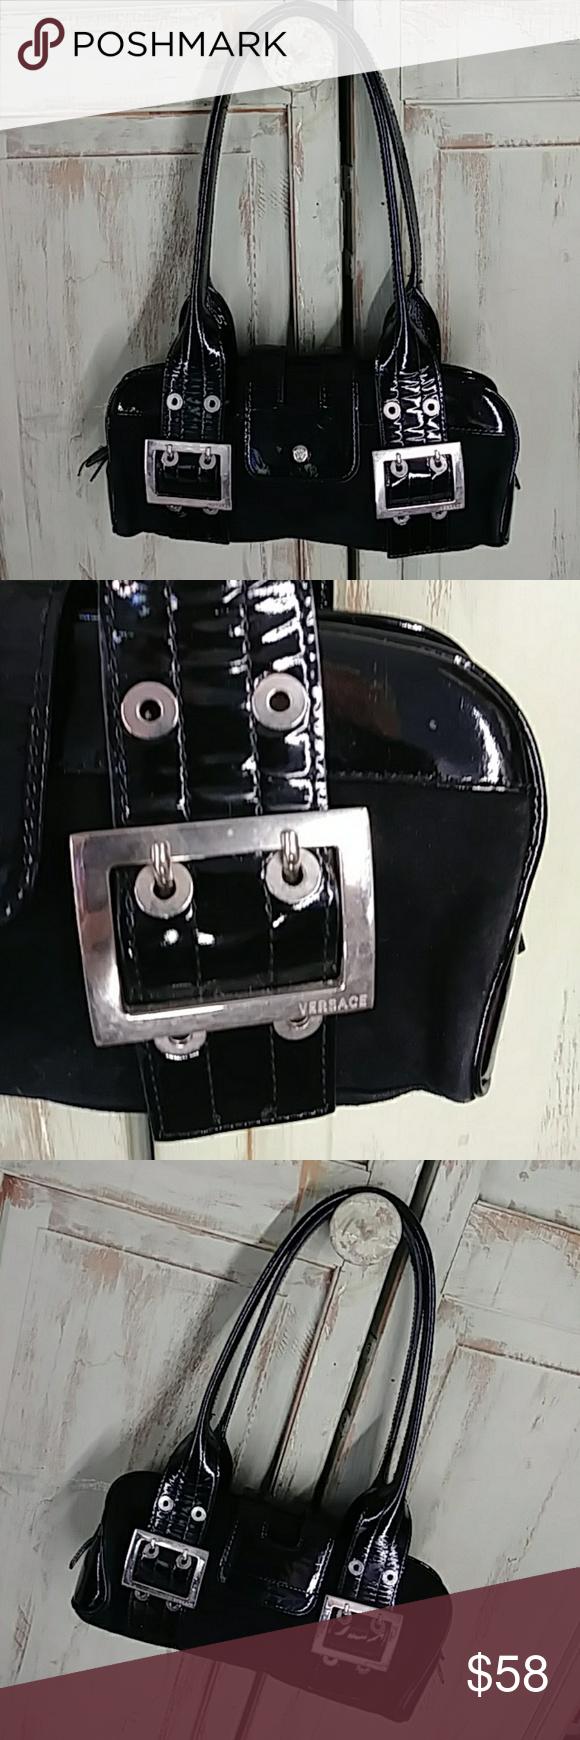 871958f8e87 Spotted while shopping on Poshmark  Gianni Versace Italian black patent  leather purse!  poshmark  fashion  shopping  style  Gianni Versace  Handbags